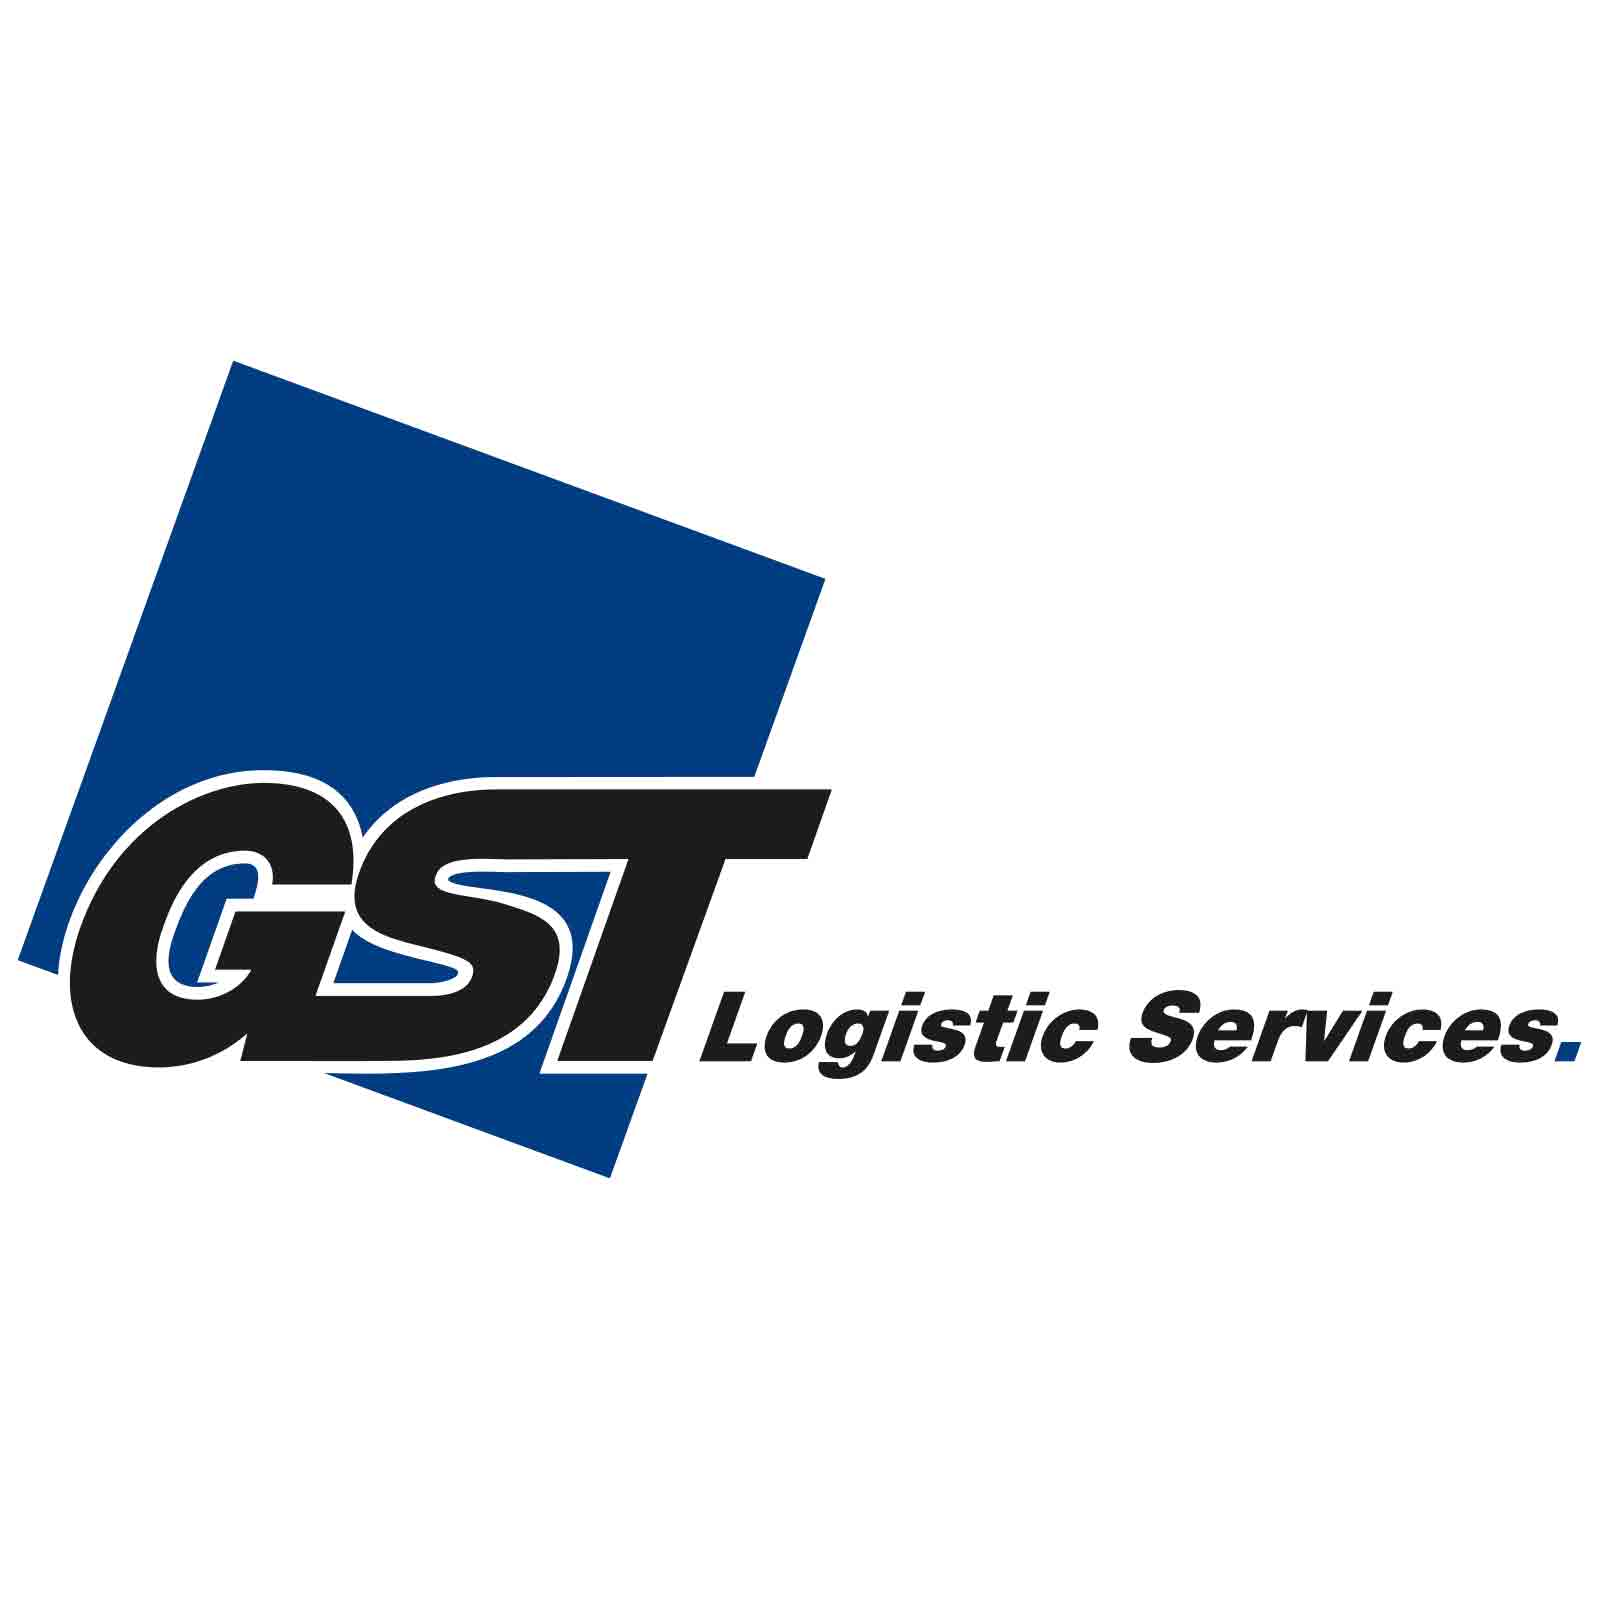 GST Logistic Services Logistikunternehmen Logo Entwicklung ShowMyProject